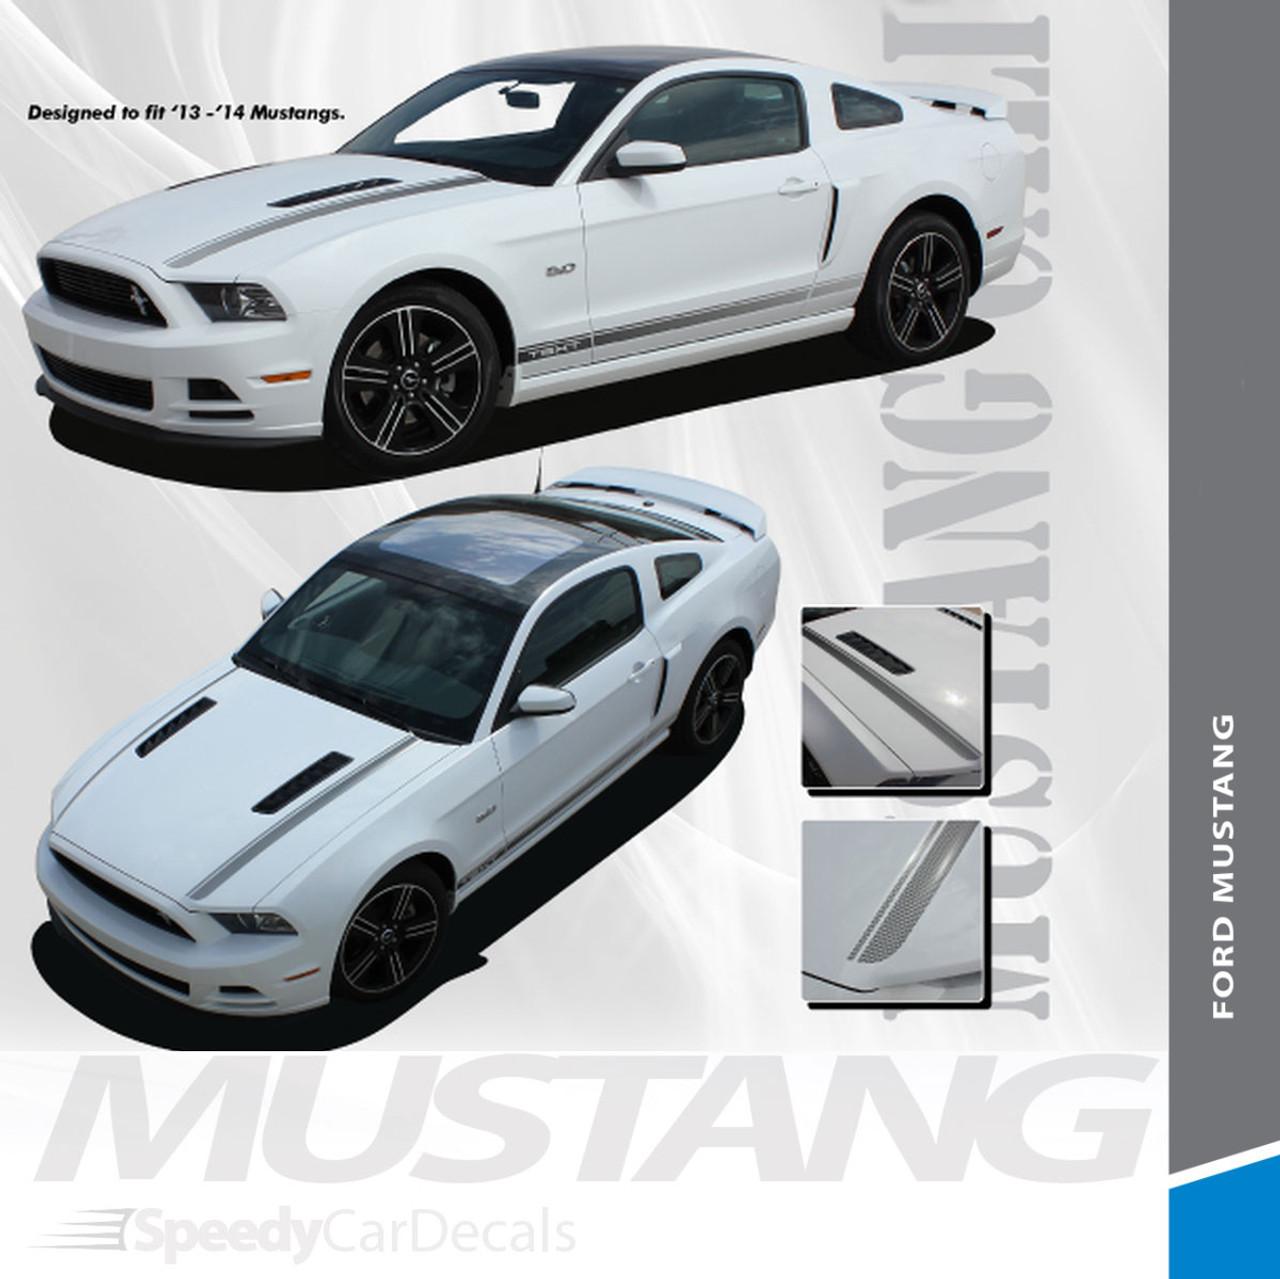 CALIFORNIA SPECIAL GT//CS Rocker Hood Vinyl Stripe Decal Graphic 2014 Mustang K33